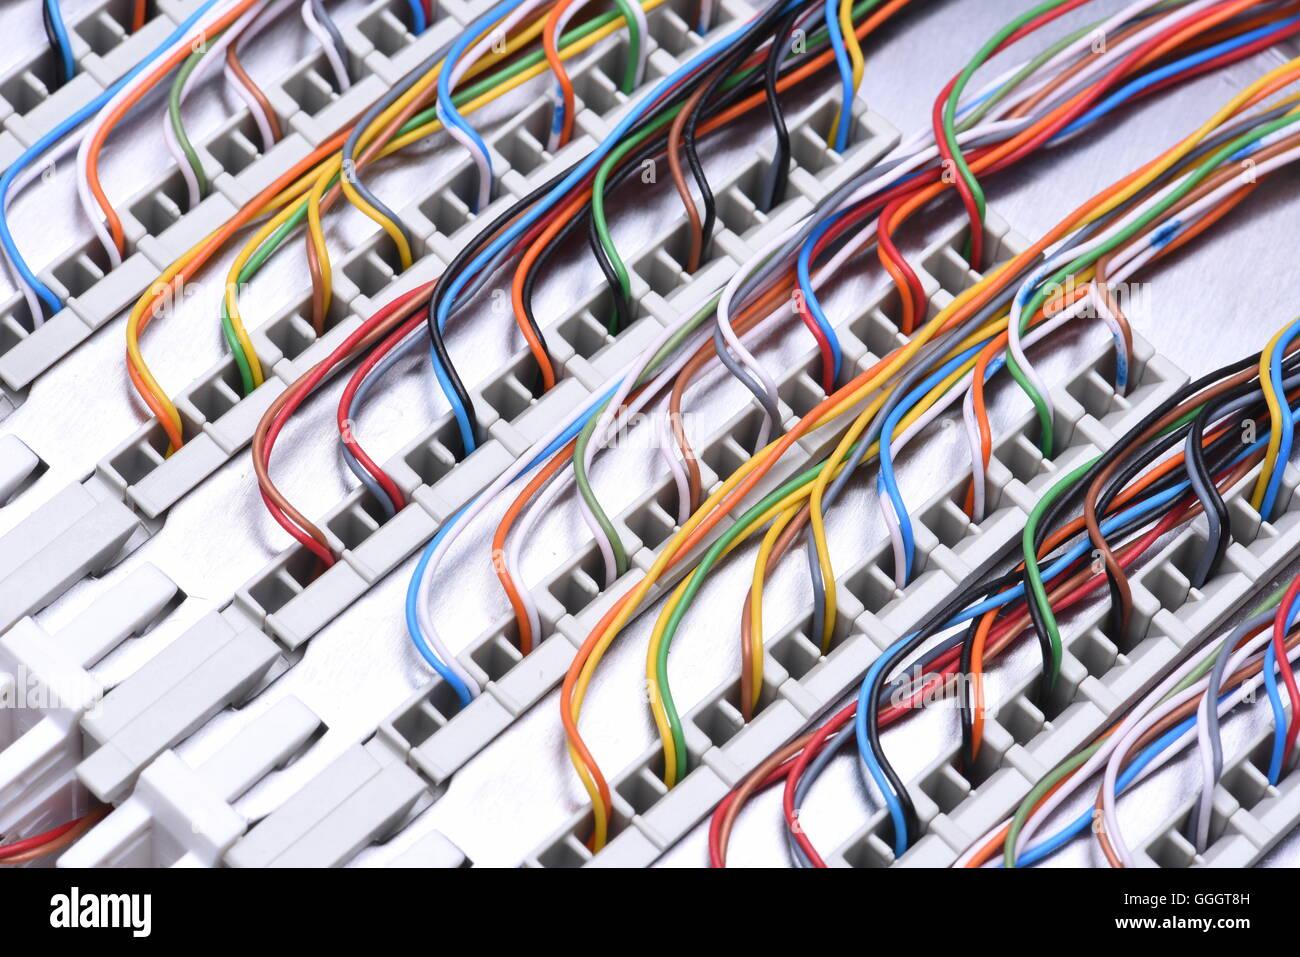 Telekommunikation-Hauptverteiler mit Kabeln, Nahaufnahme Stockfoto ...